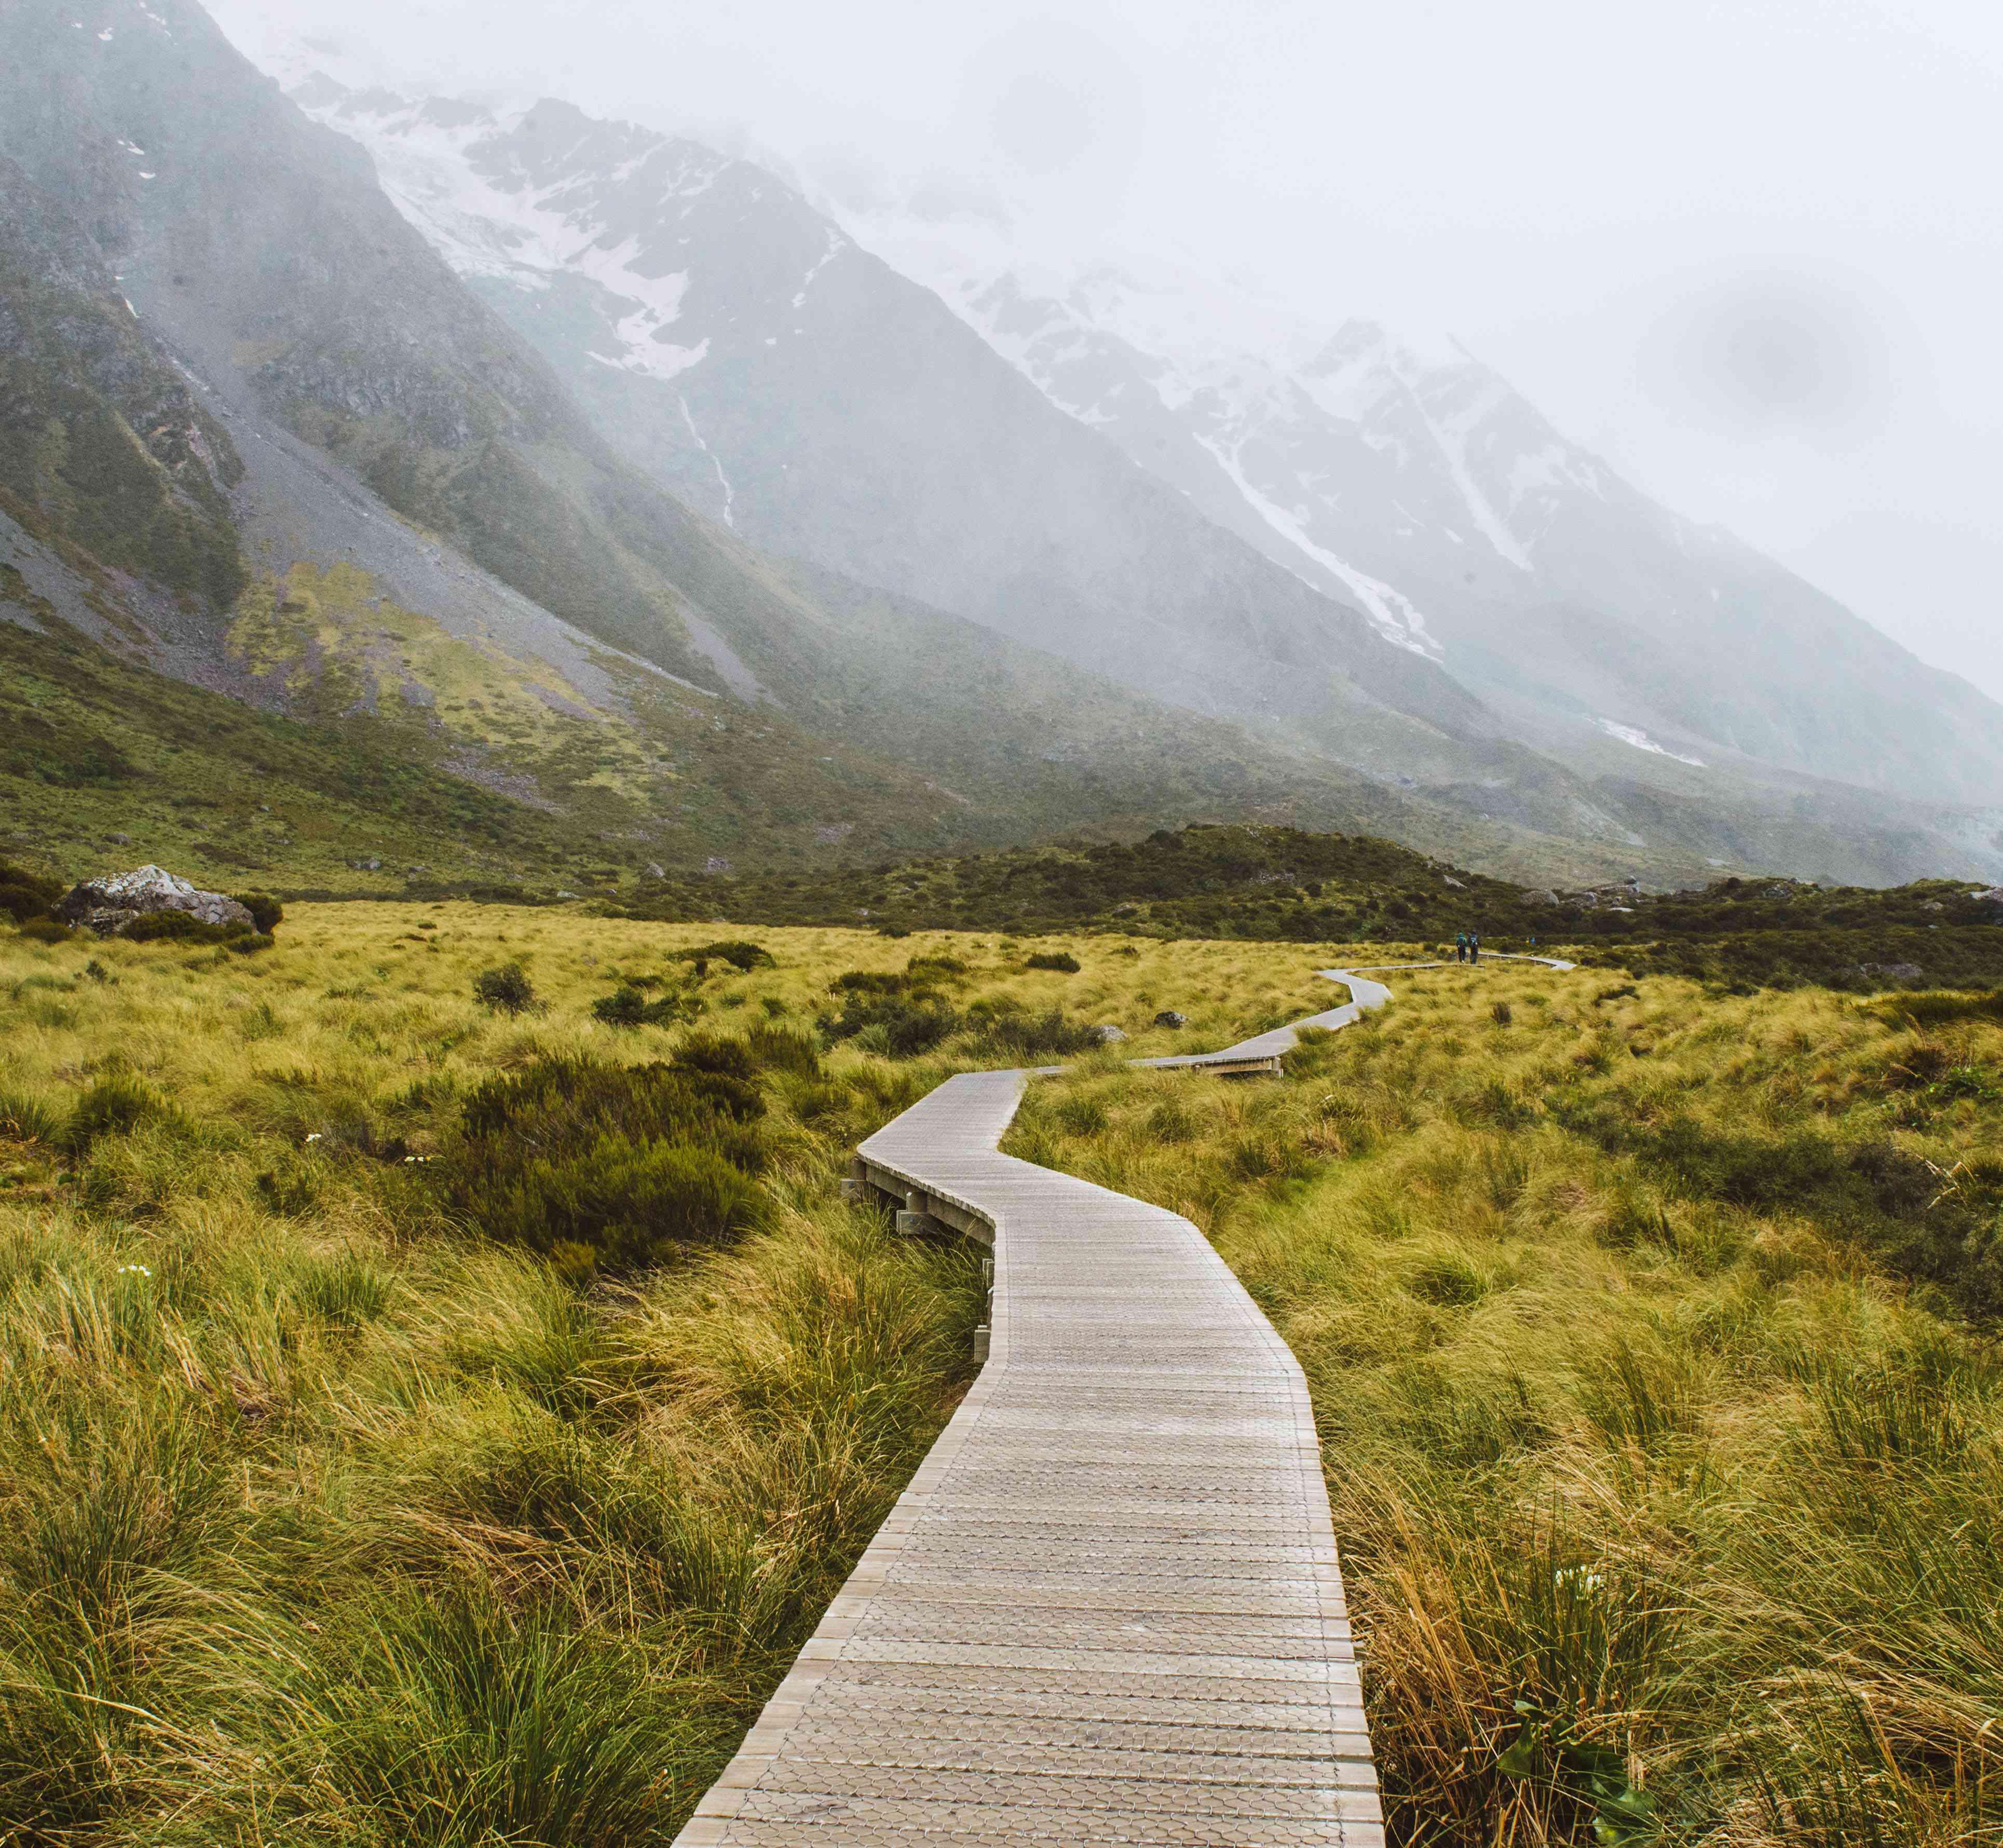 Wooden walkway through Hooker Valley trail